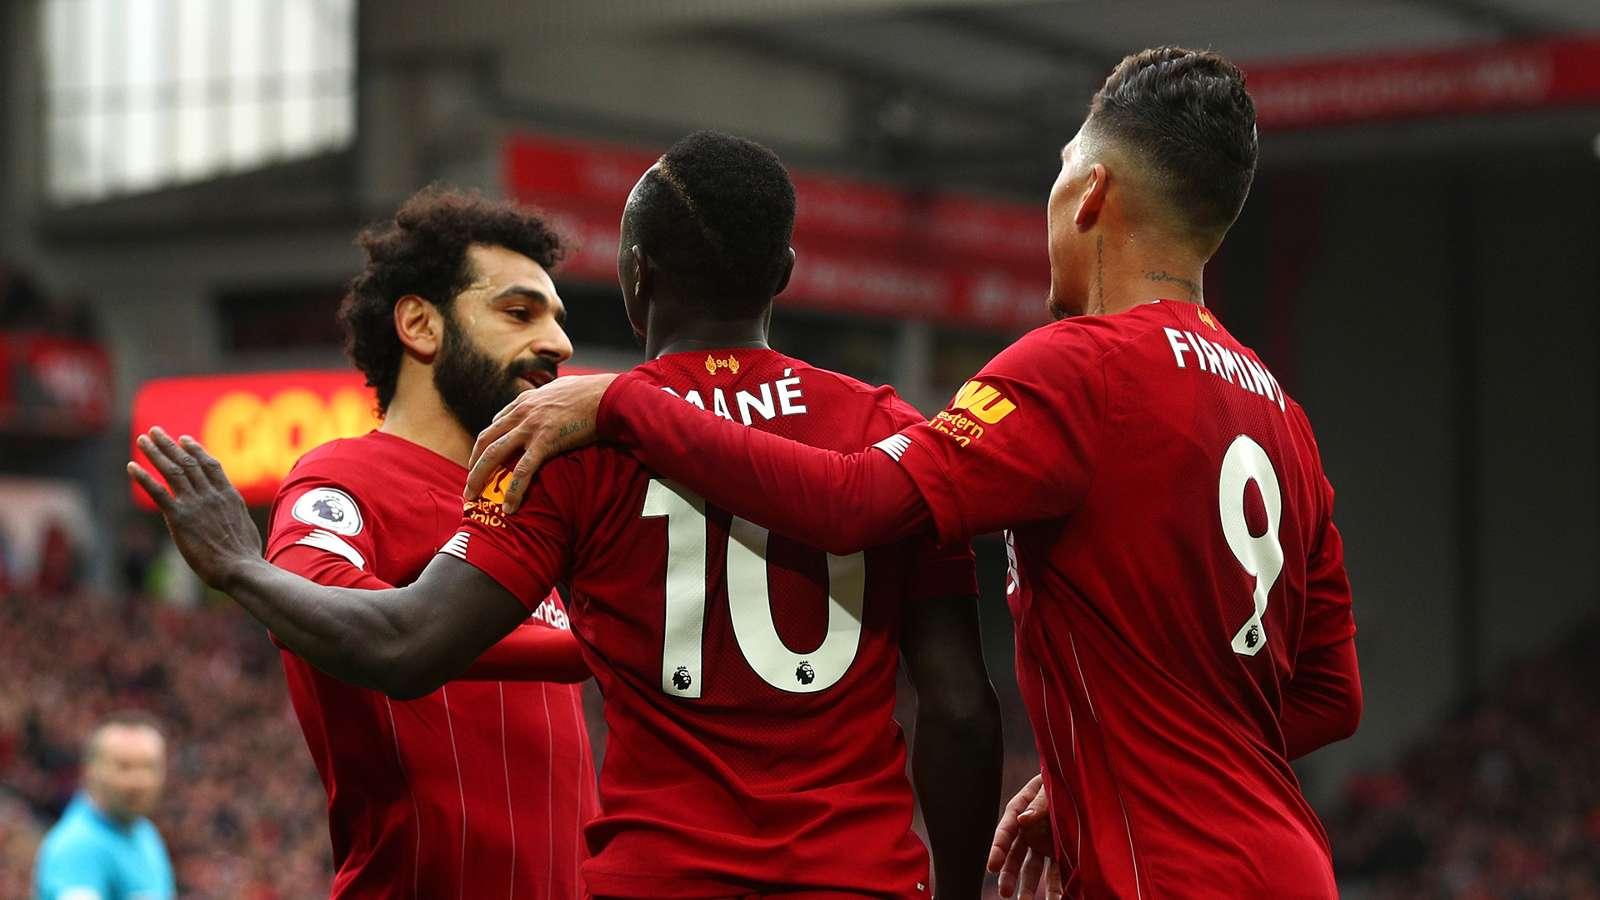 Mohamed Salah Sadio Mane Roberto Firmino Liverpool 19-20